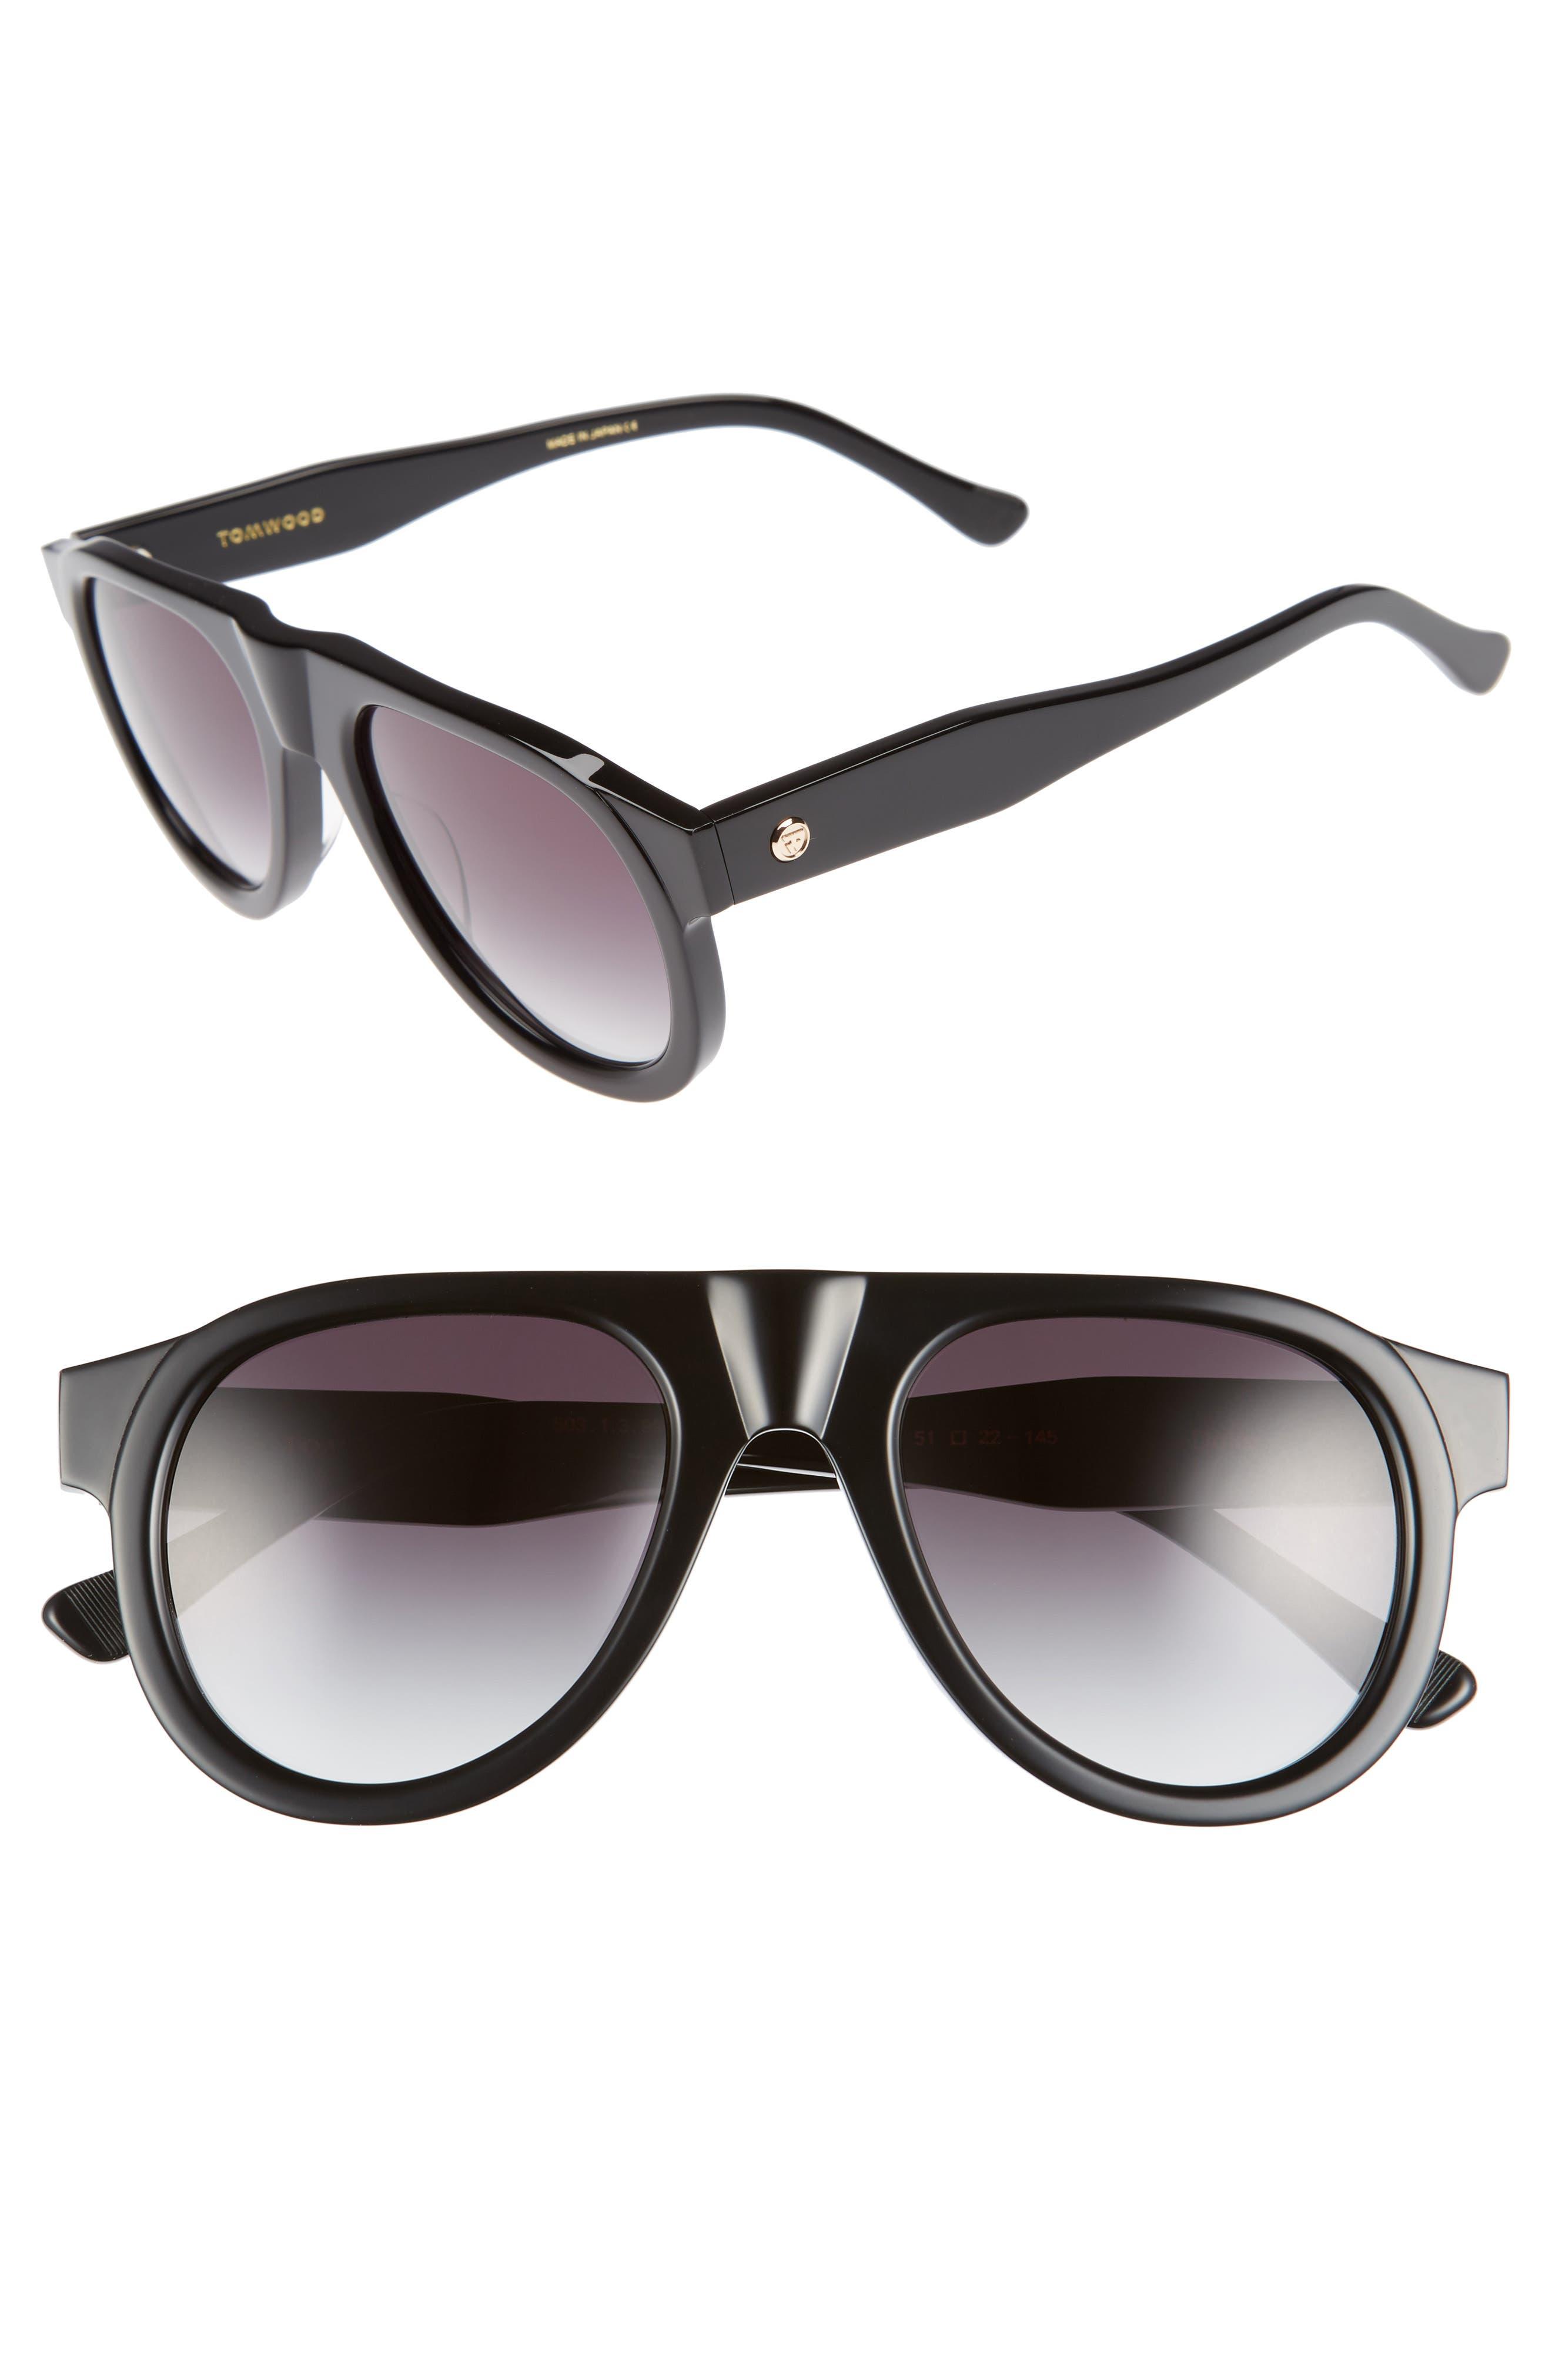 Duke Aviator Sunglasses,                             Main thumbnail 1, color,                             001